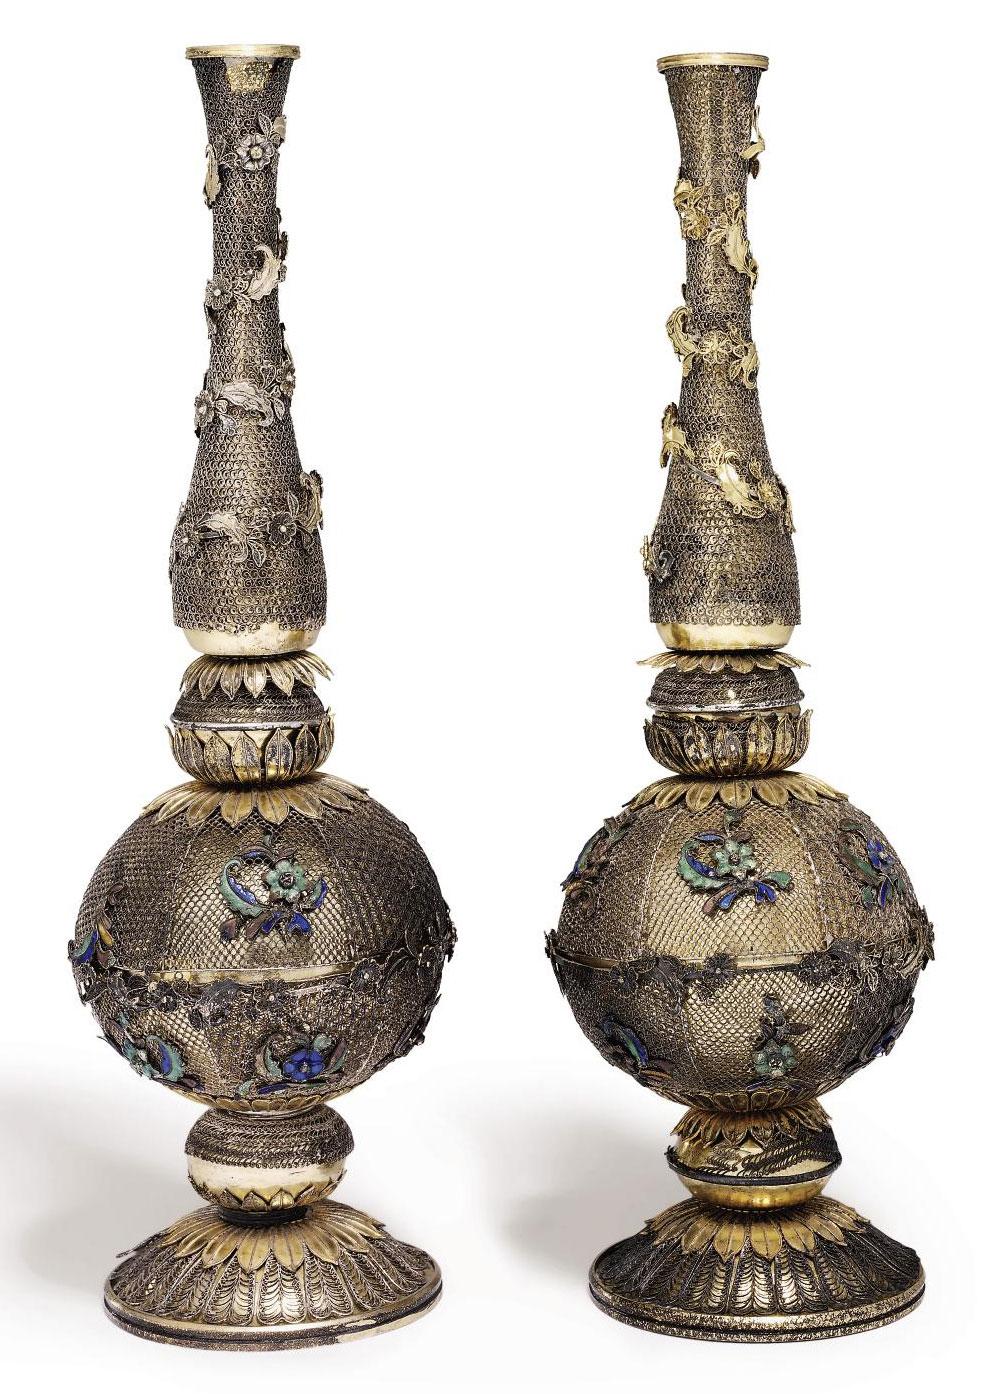 a pair of enamelled silver gilt and filigree sprinklers made for the middle eastern market. Black Bedroom Furniture Sets. Home Design Ideas